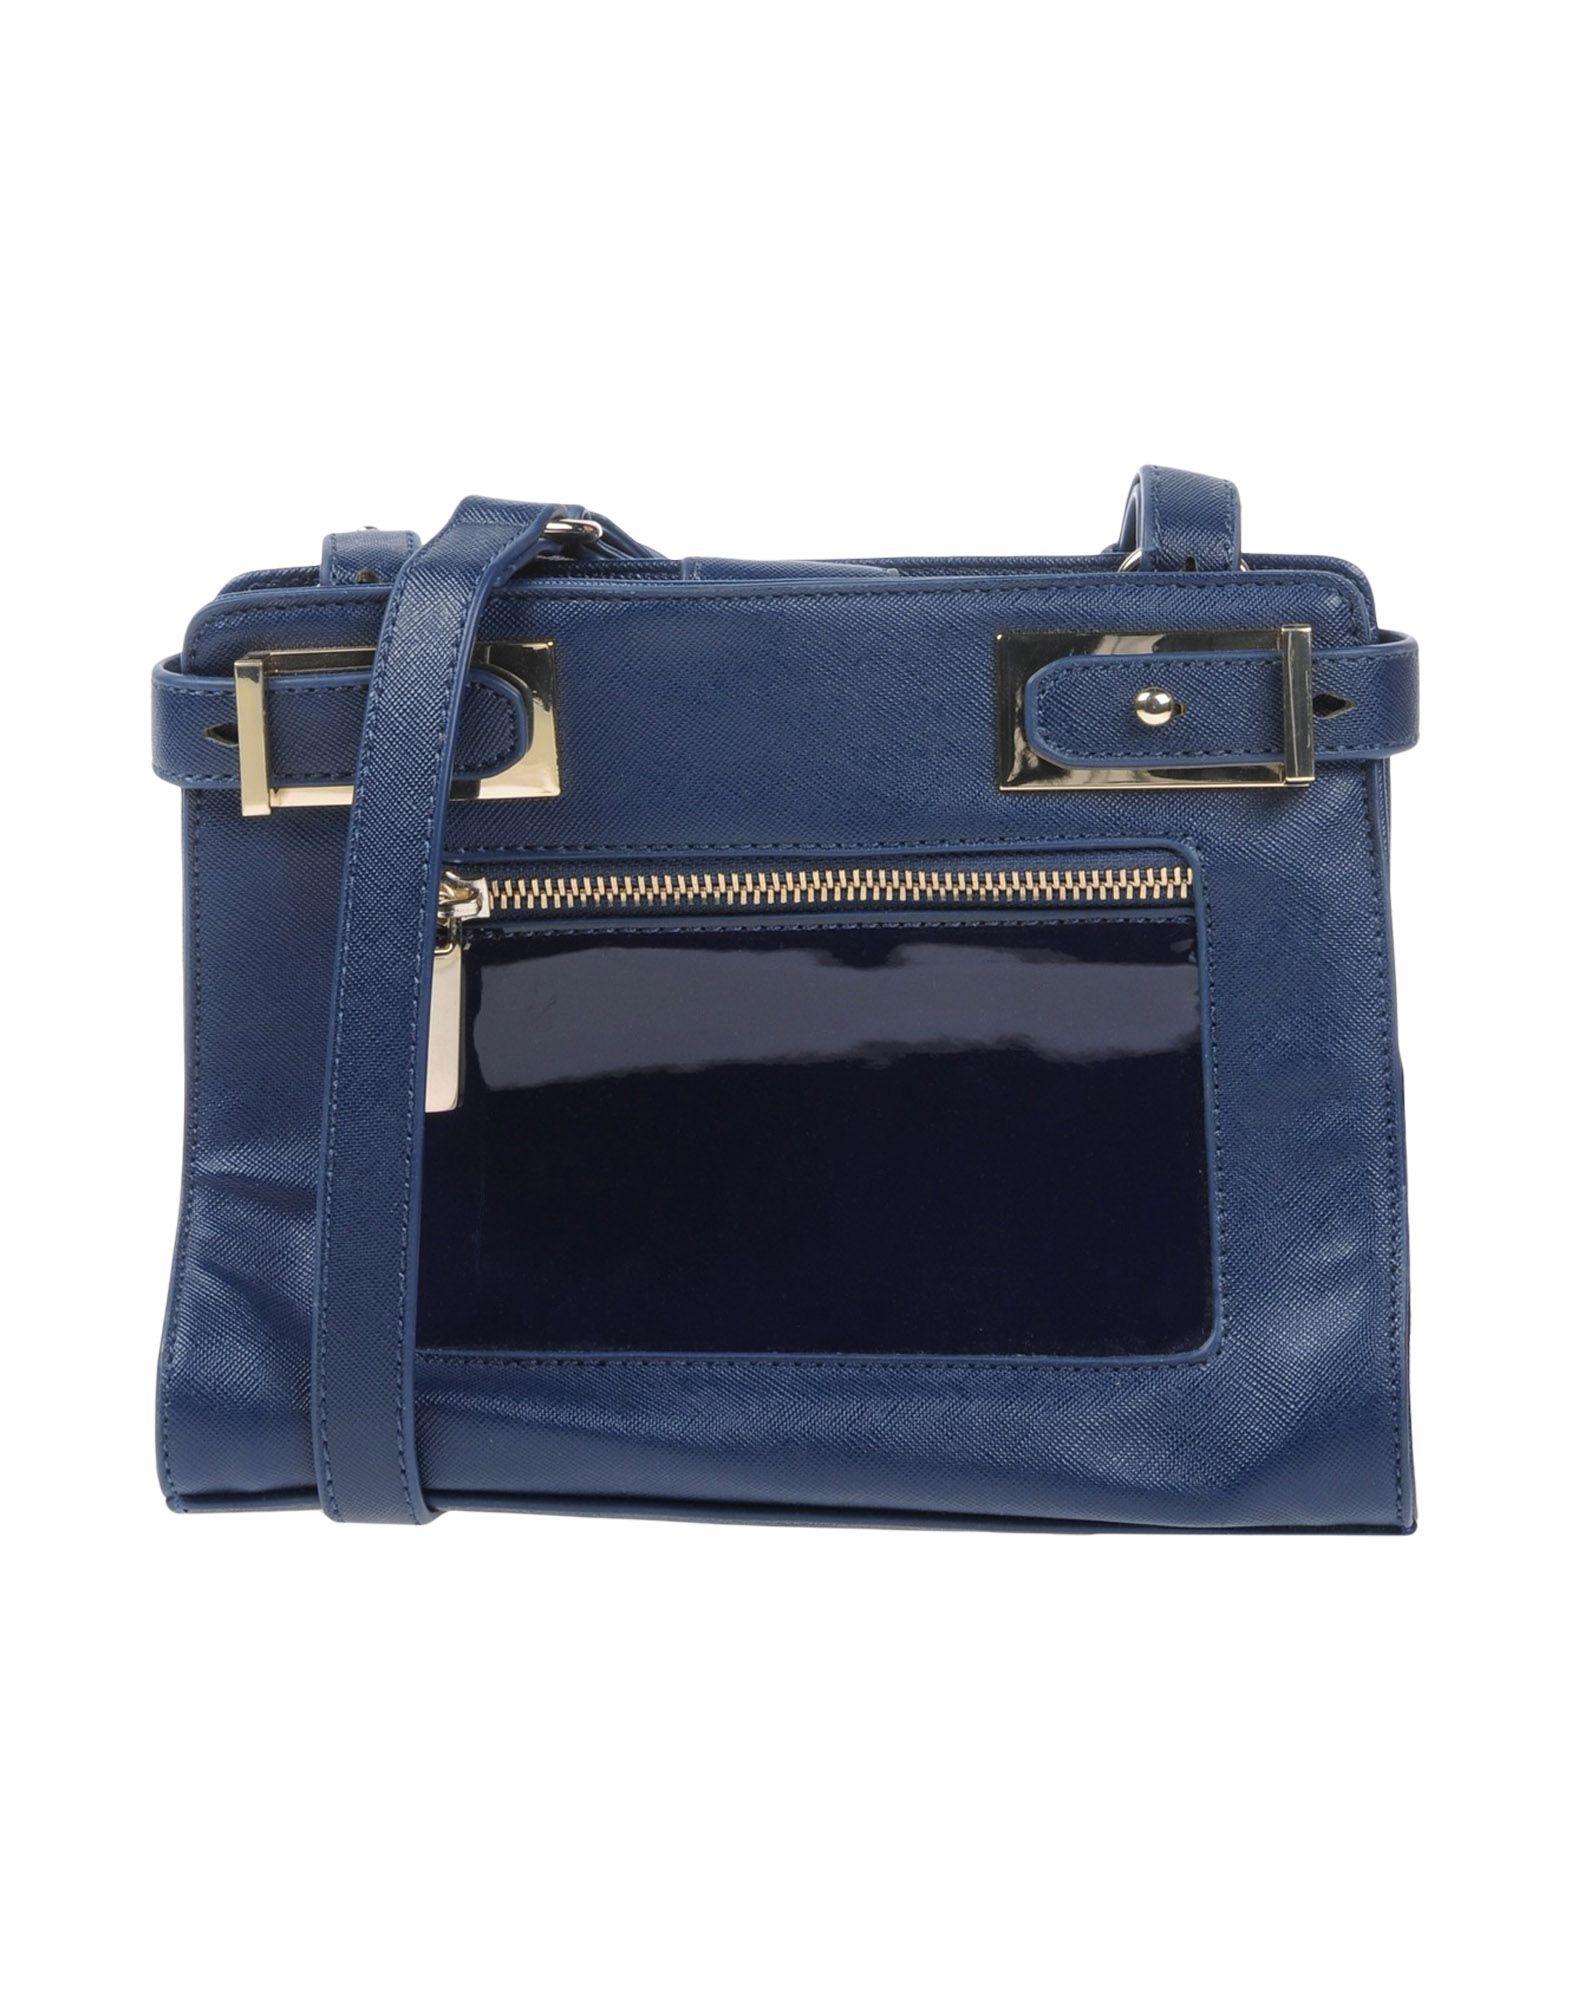 PINKO Сумка через плечо сумка через плечо anais gvani croco ag 1471 350161